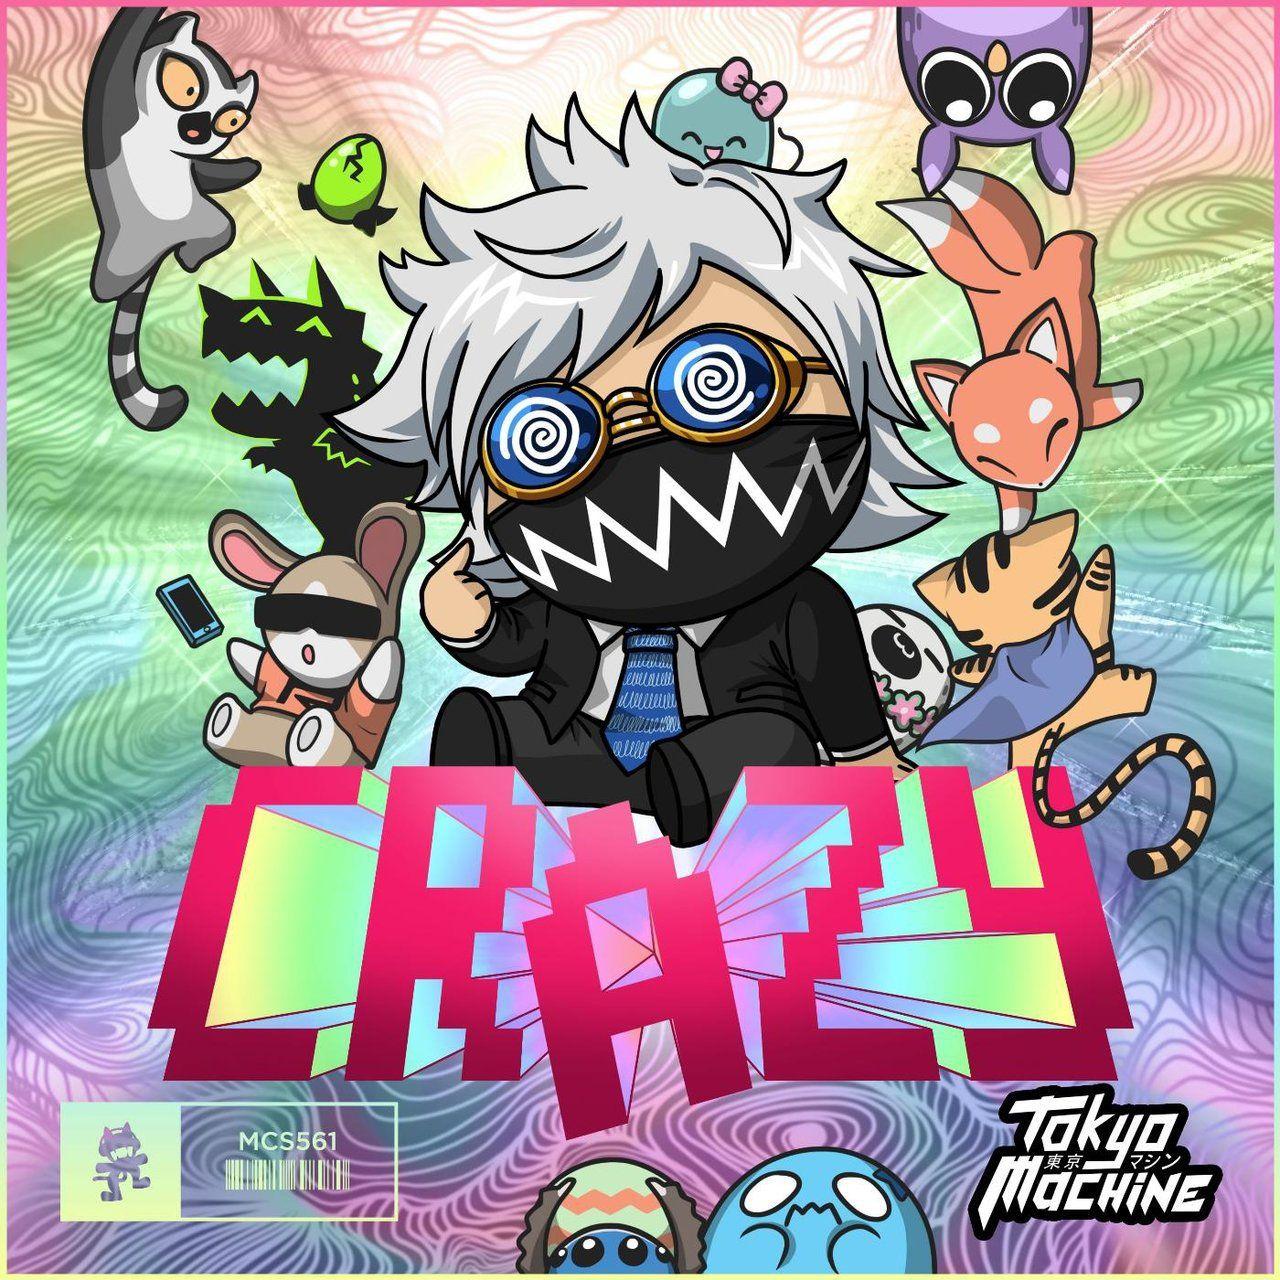 Tokyo Machine Crazy MP3 Download Free 320 Kbps (con